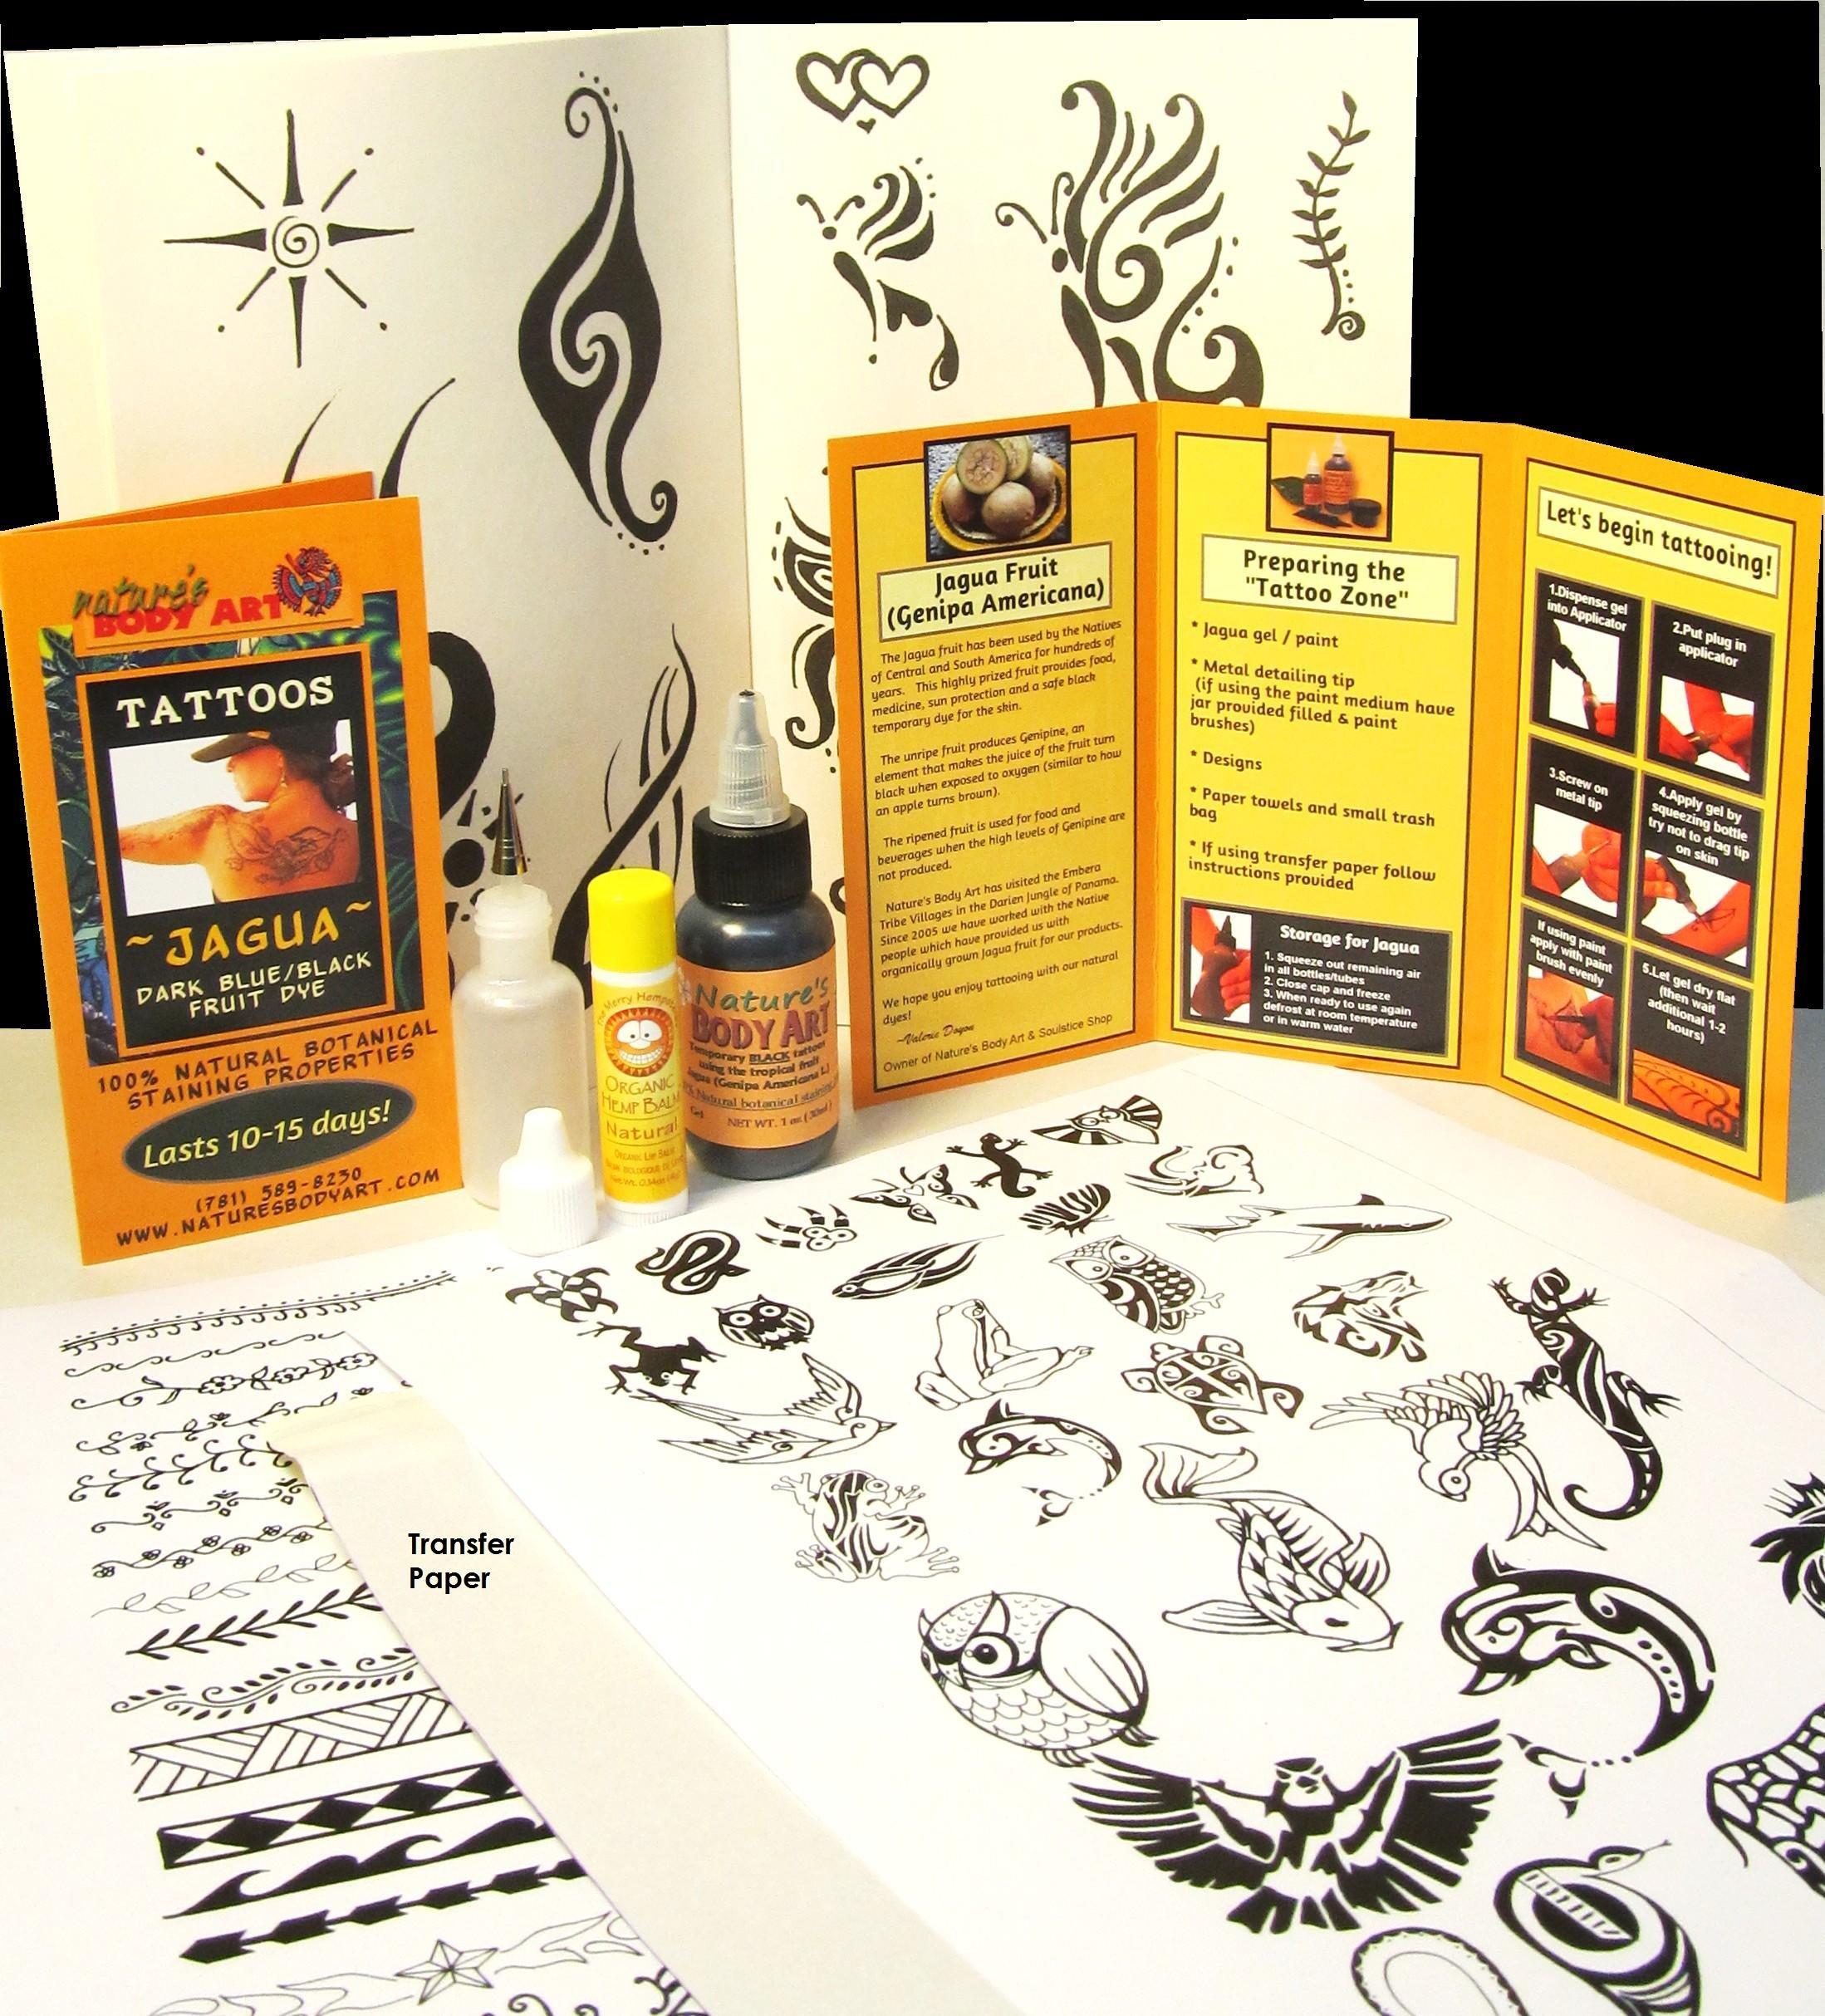 Amazon.com : Henna City All-Natural Jagua Tattoo Kit (1 OZ